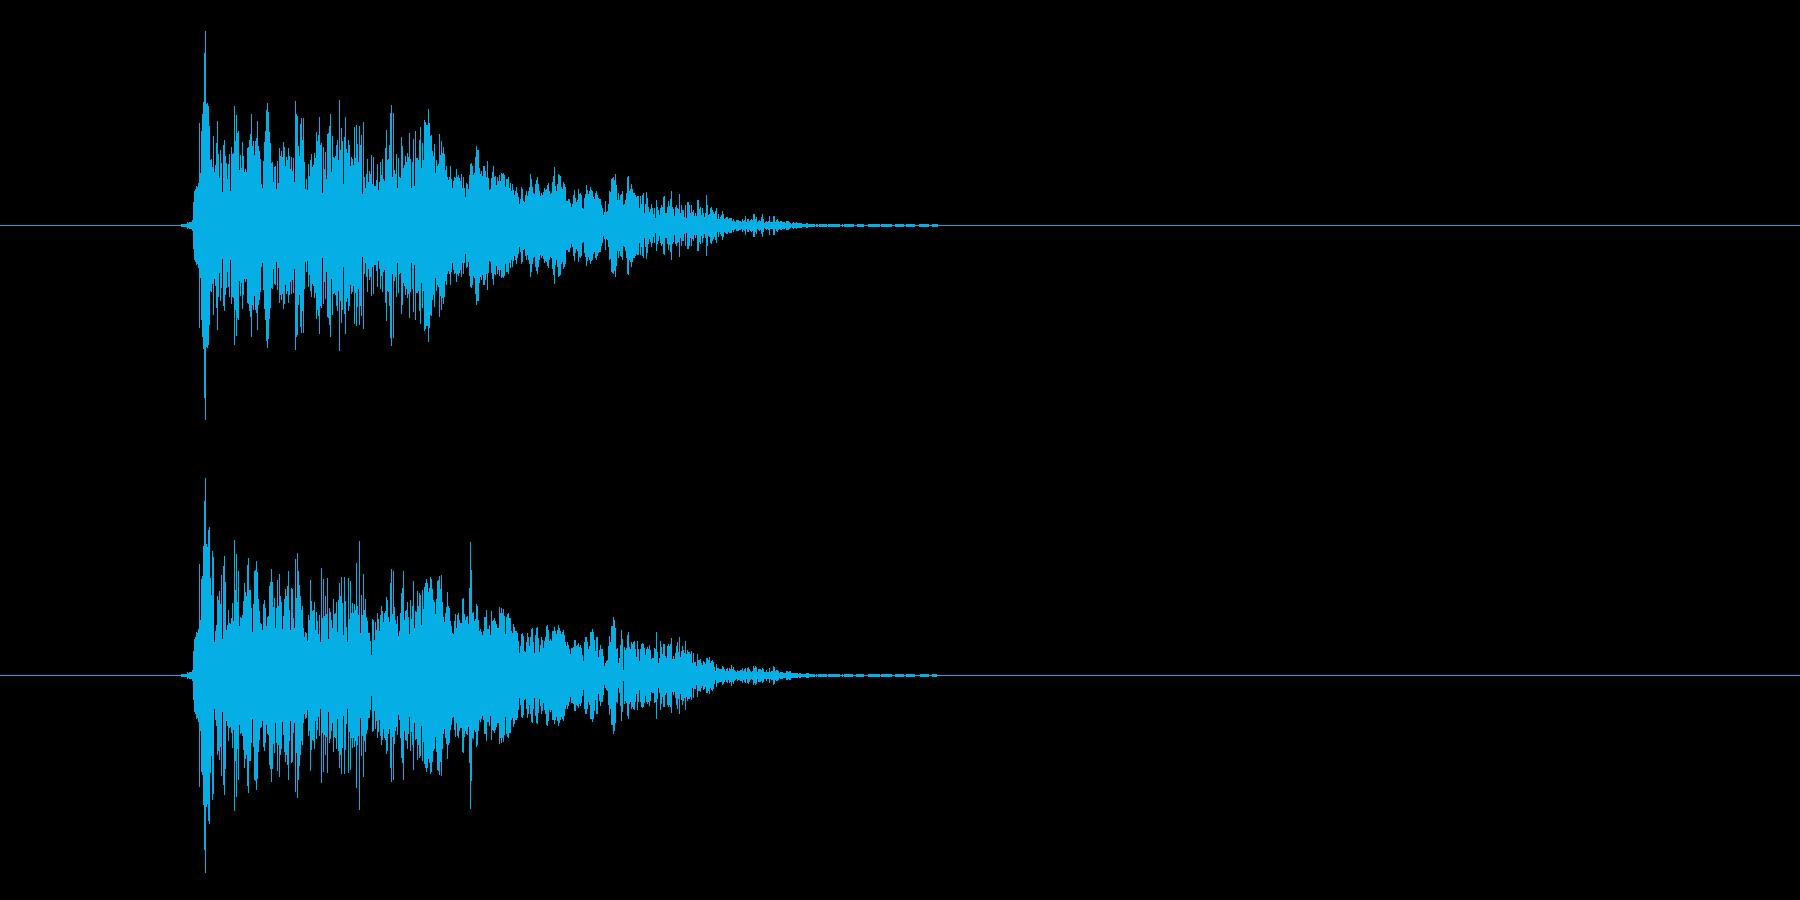 Pao!の再生済みの波形